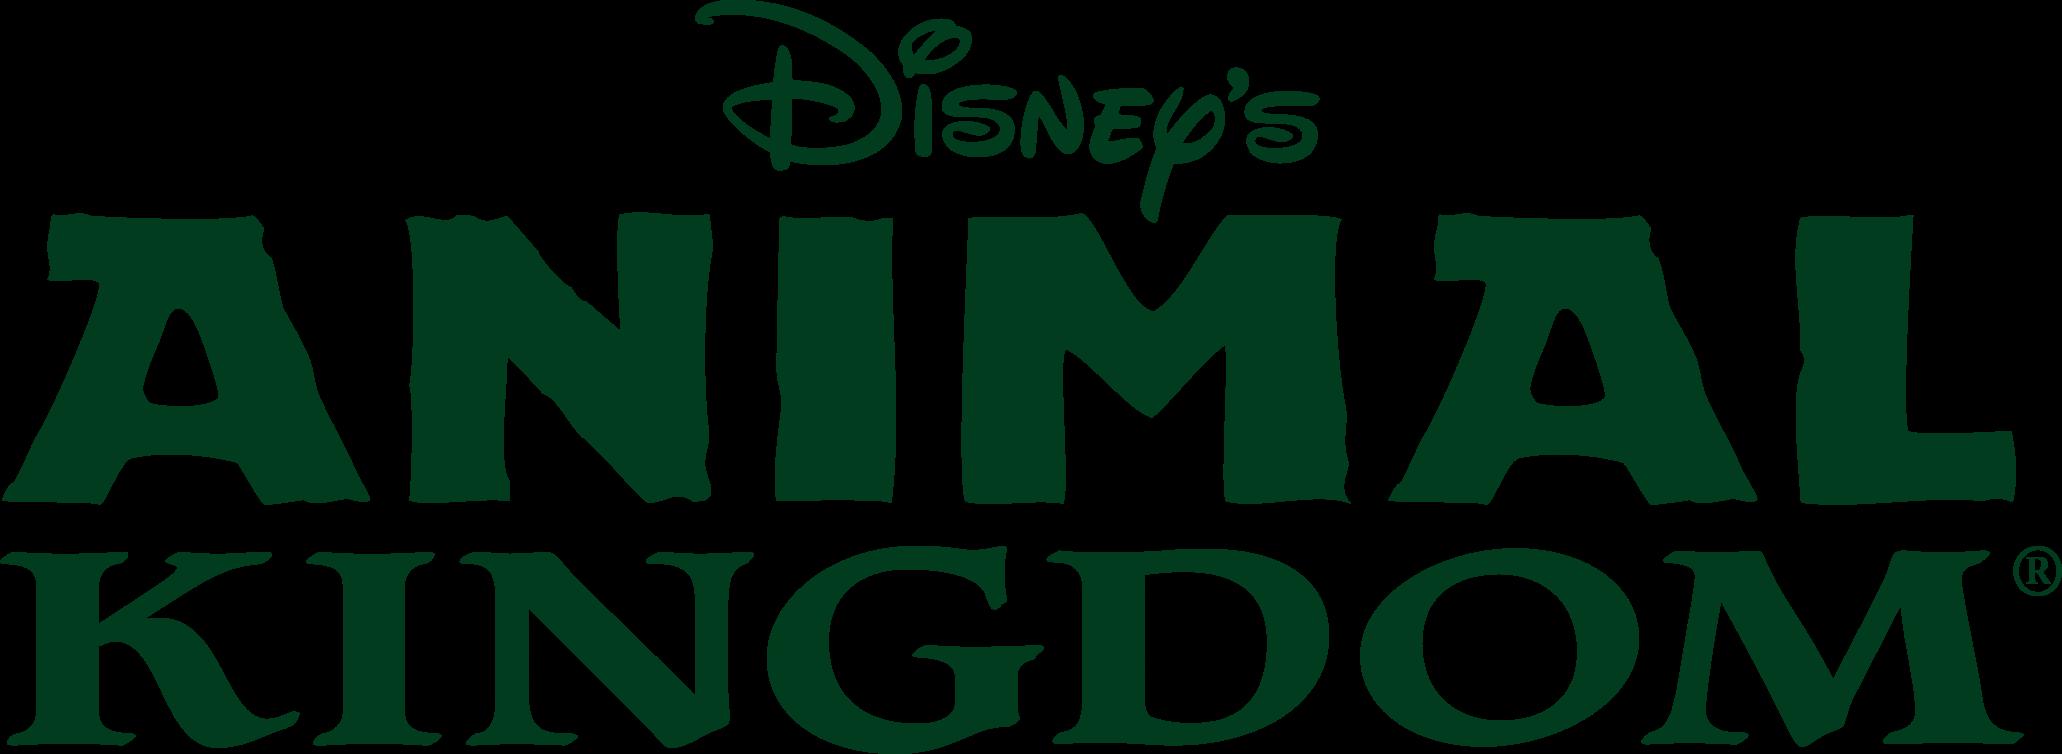 Disney's Animal Kingdom Wordmark - Disney World Animal Kingdom Logo (2062x754), Png Download